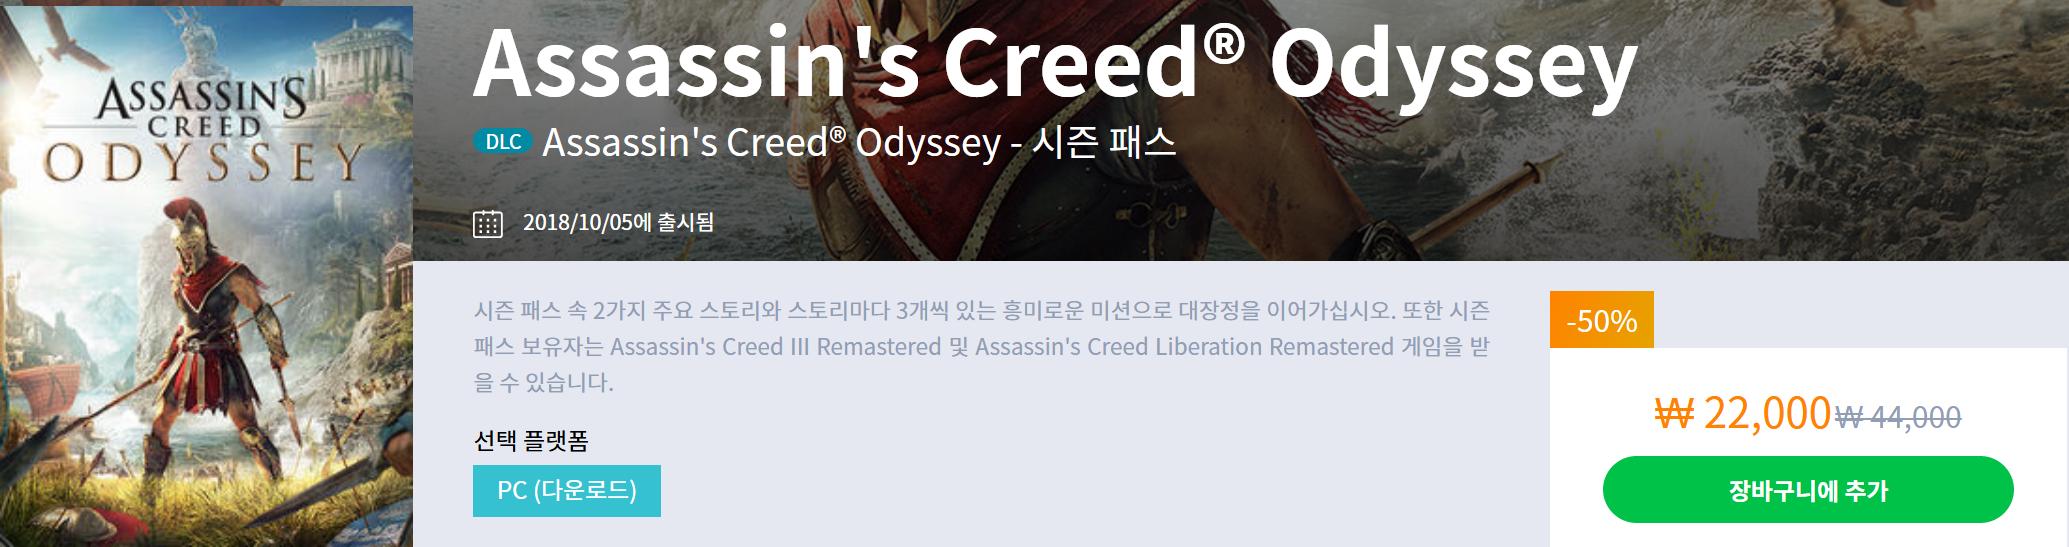 Screenshot_2019-08-20 Assassin's Creed® Odyssey - 시즌 패스 - KR_Ubisoft.png